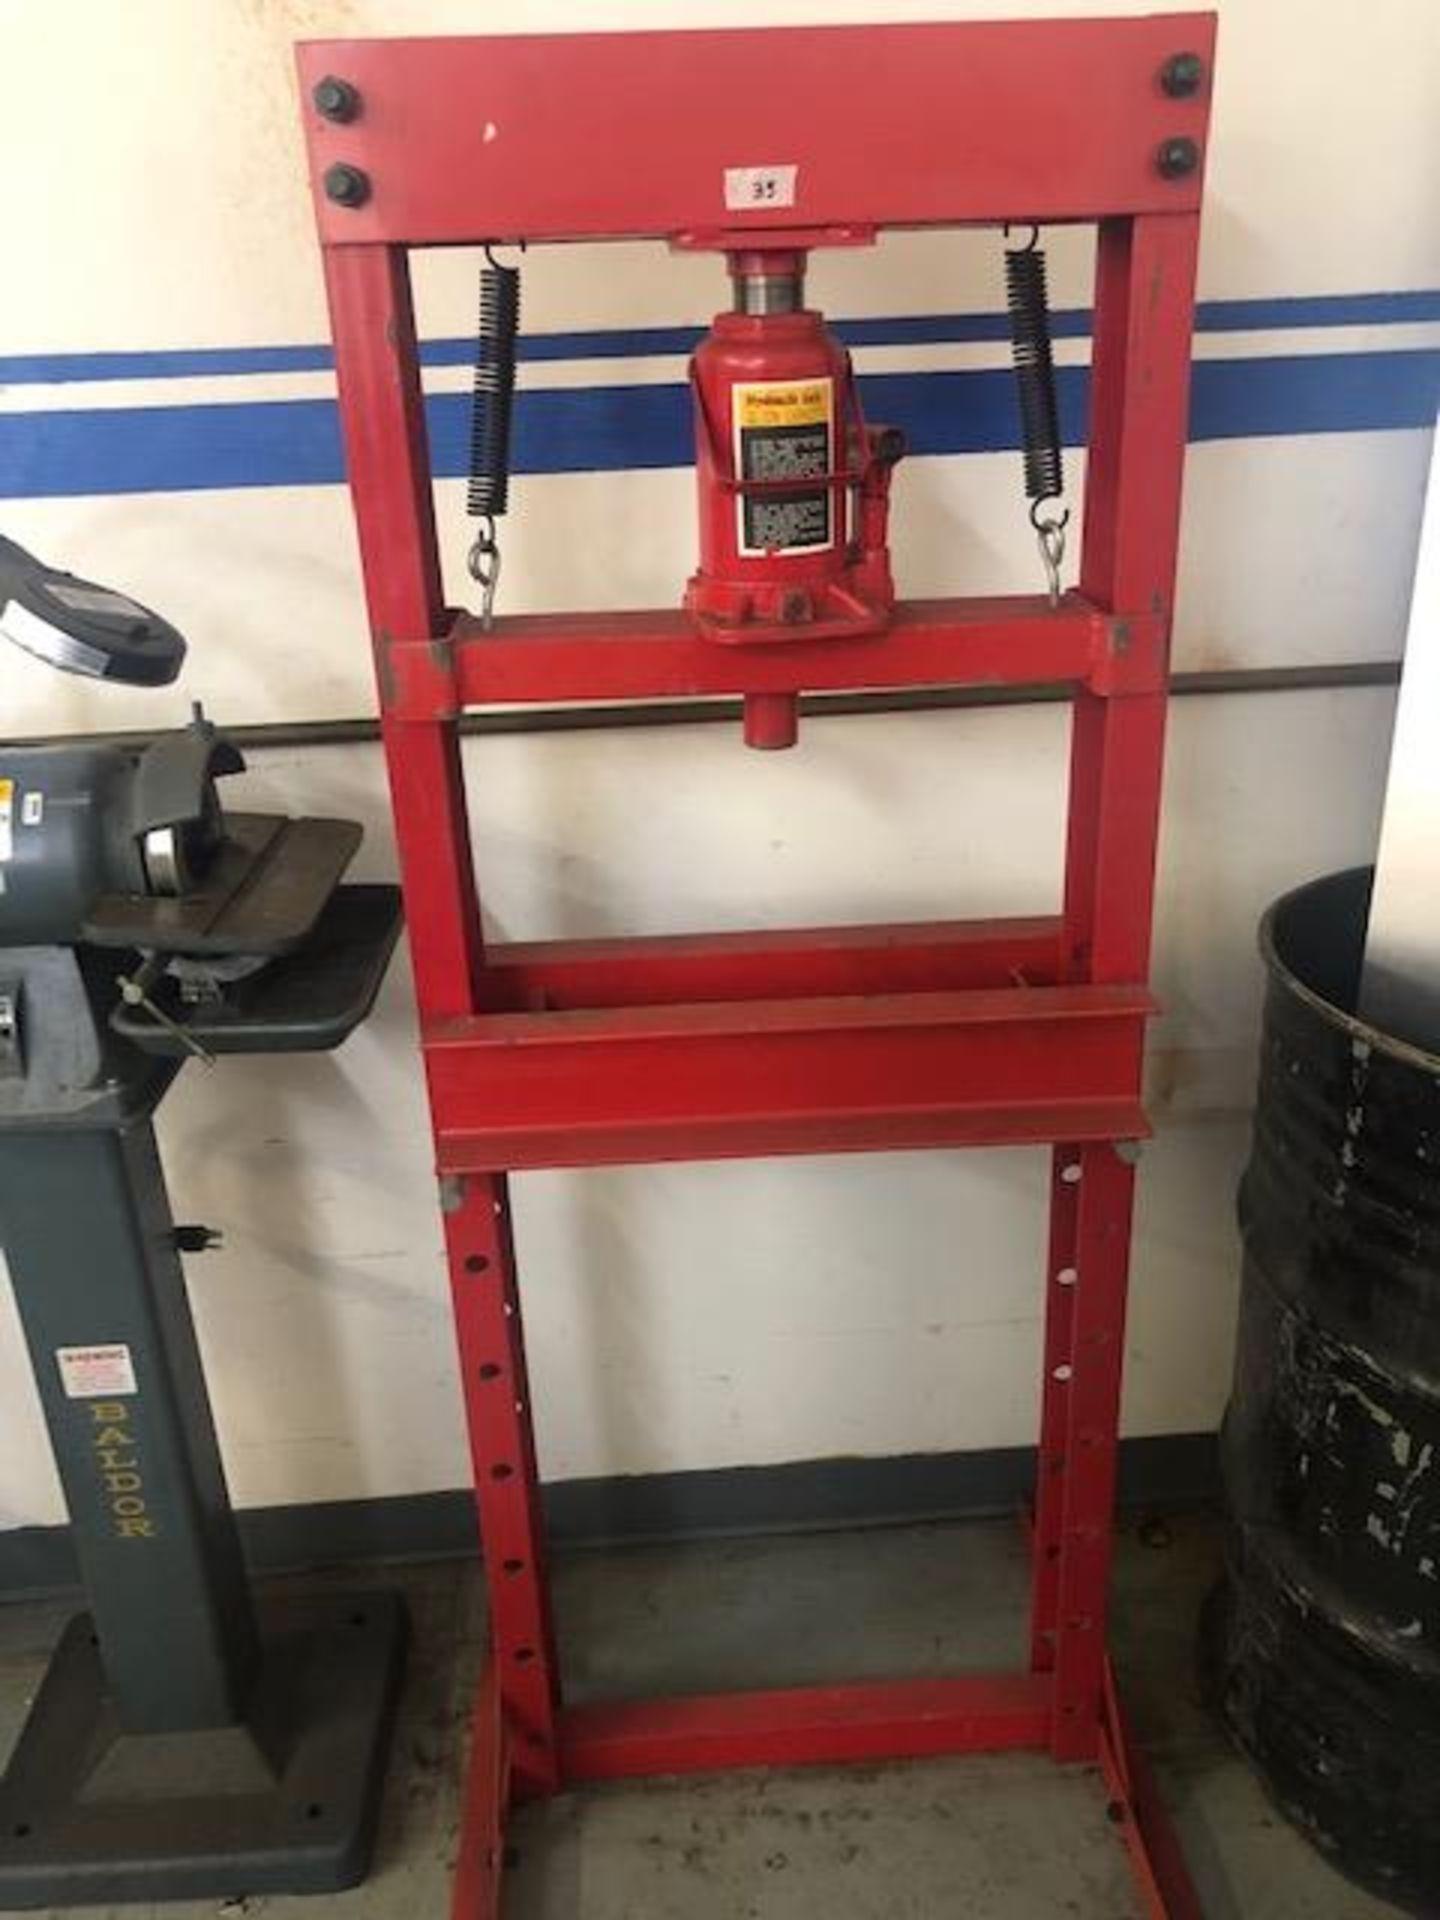 Lot 35 - MSC Industrial Supply Co. hydrolic press, 20 ton capacity